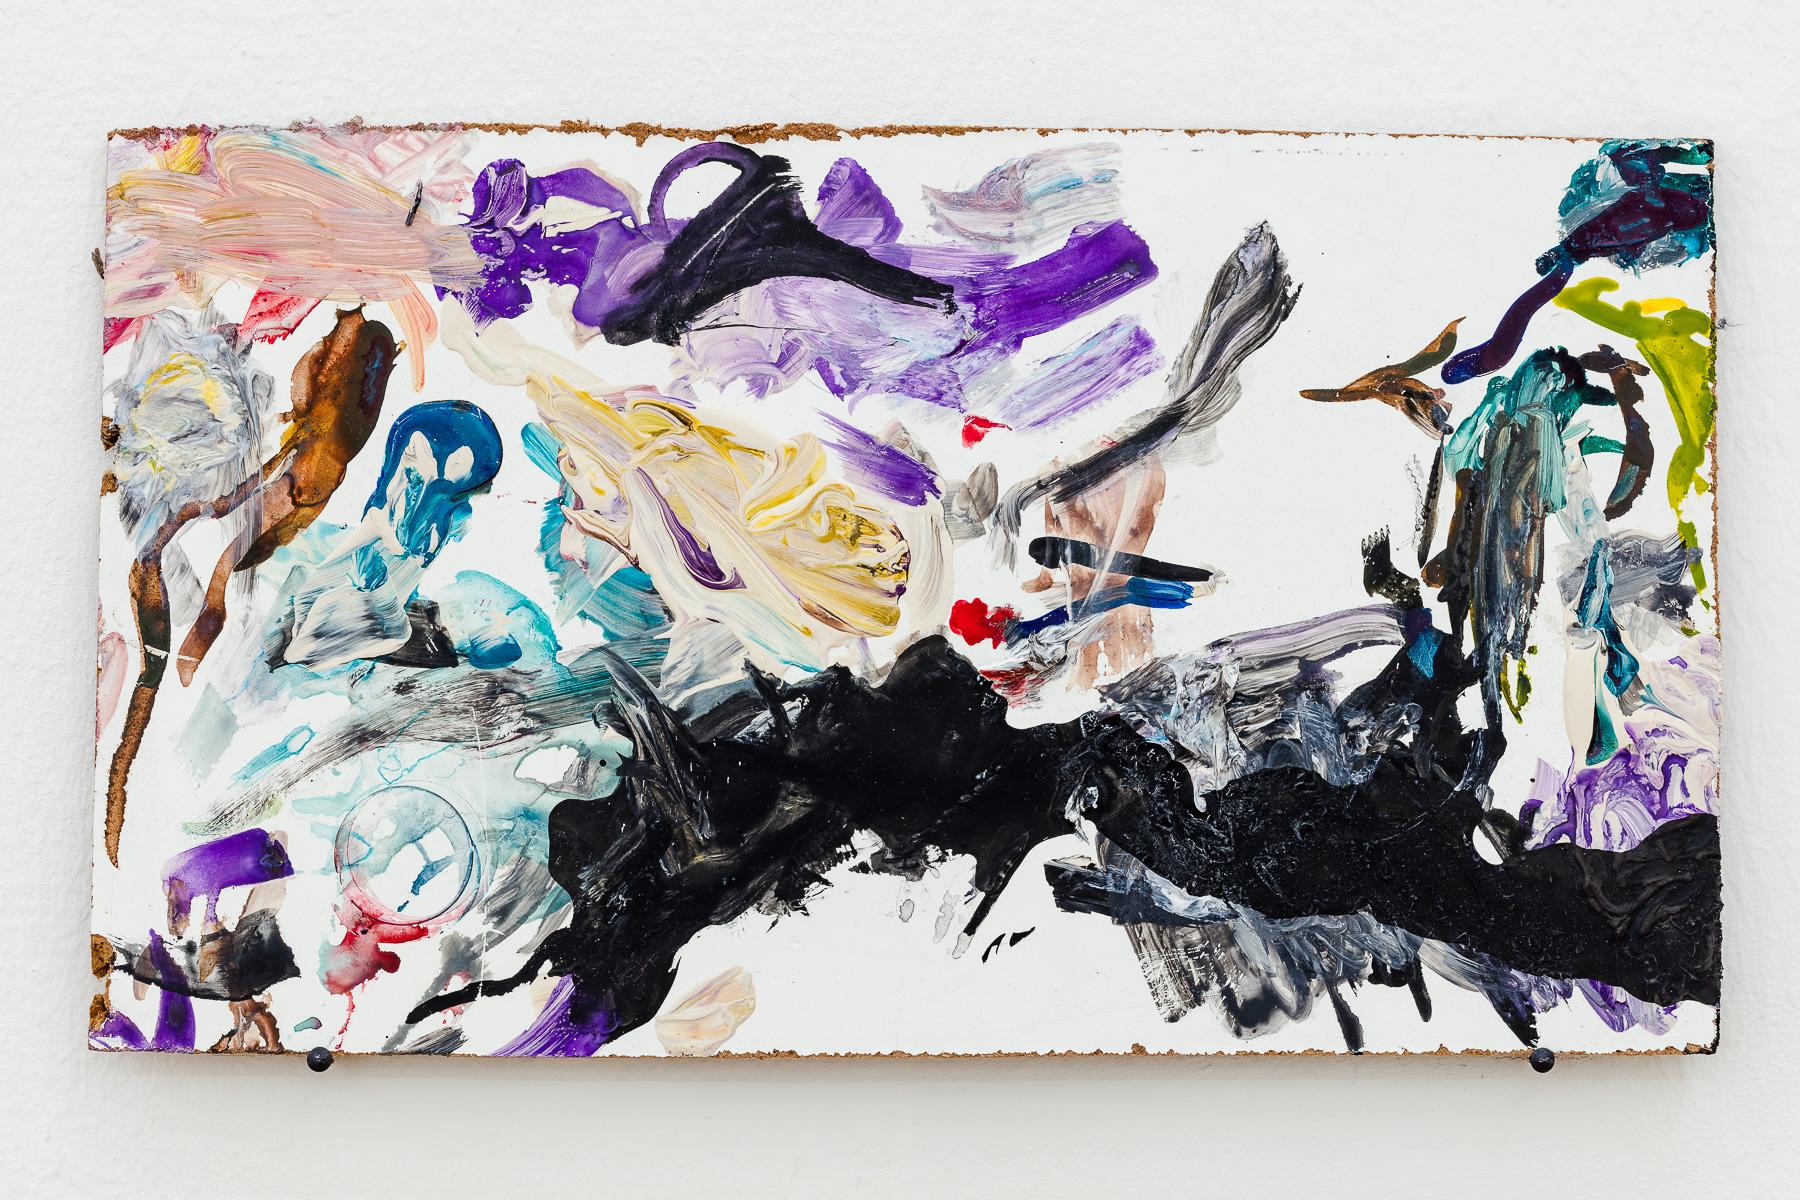 2019_05_20_Elke-Krystufek_Croy-Nielsen_by-kunst-dokumentation-com_010_web.jpg